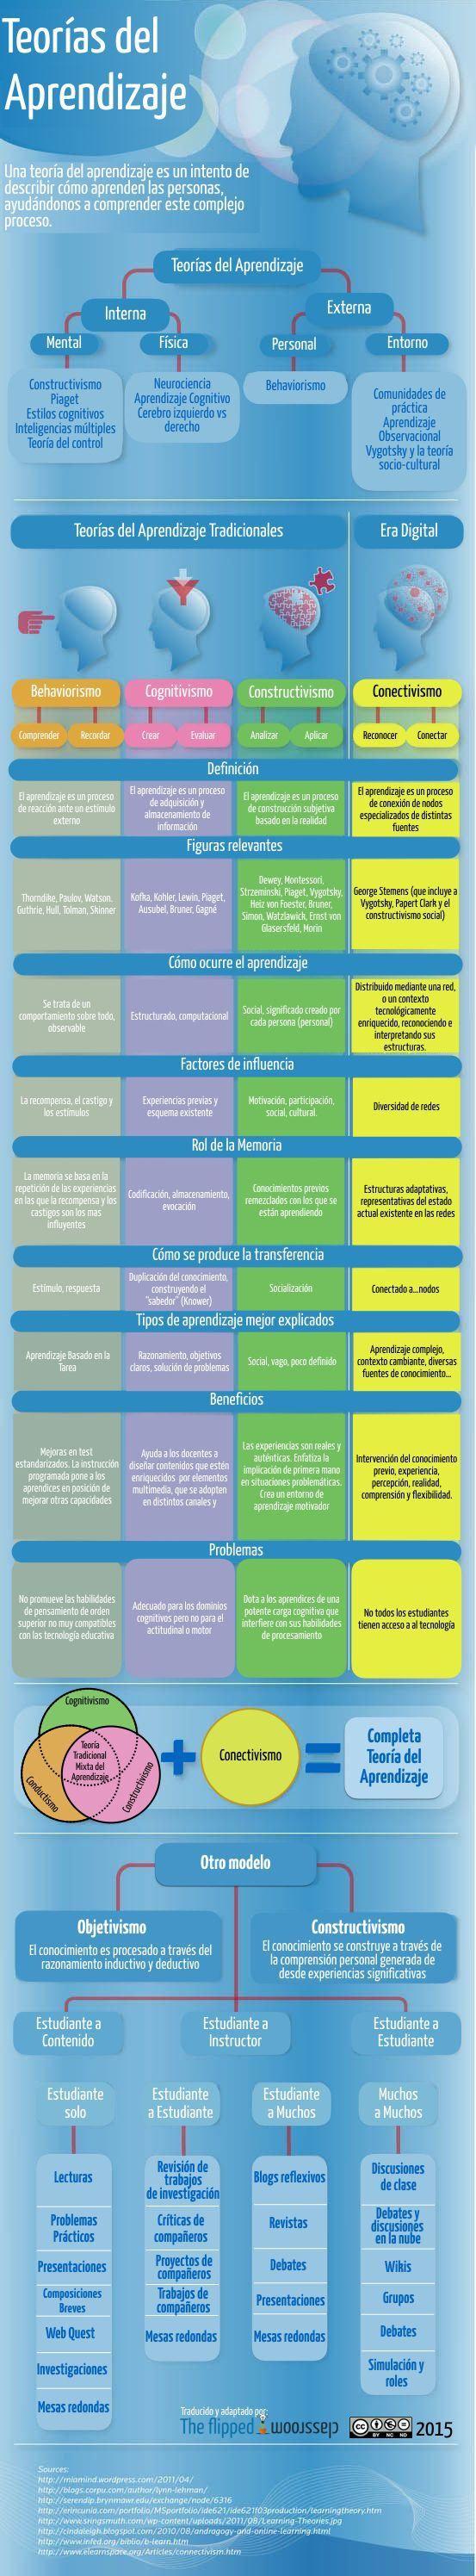 TeoríasSobreComoAprendenPersonas-Infografía-BlogGesvin